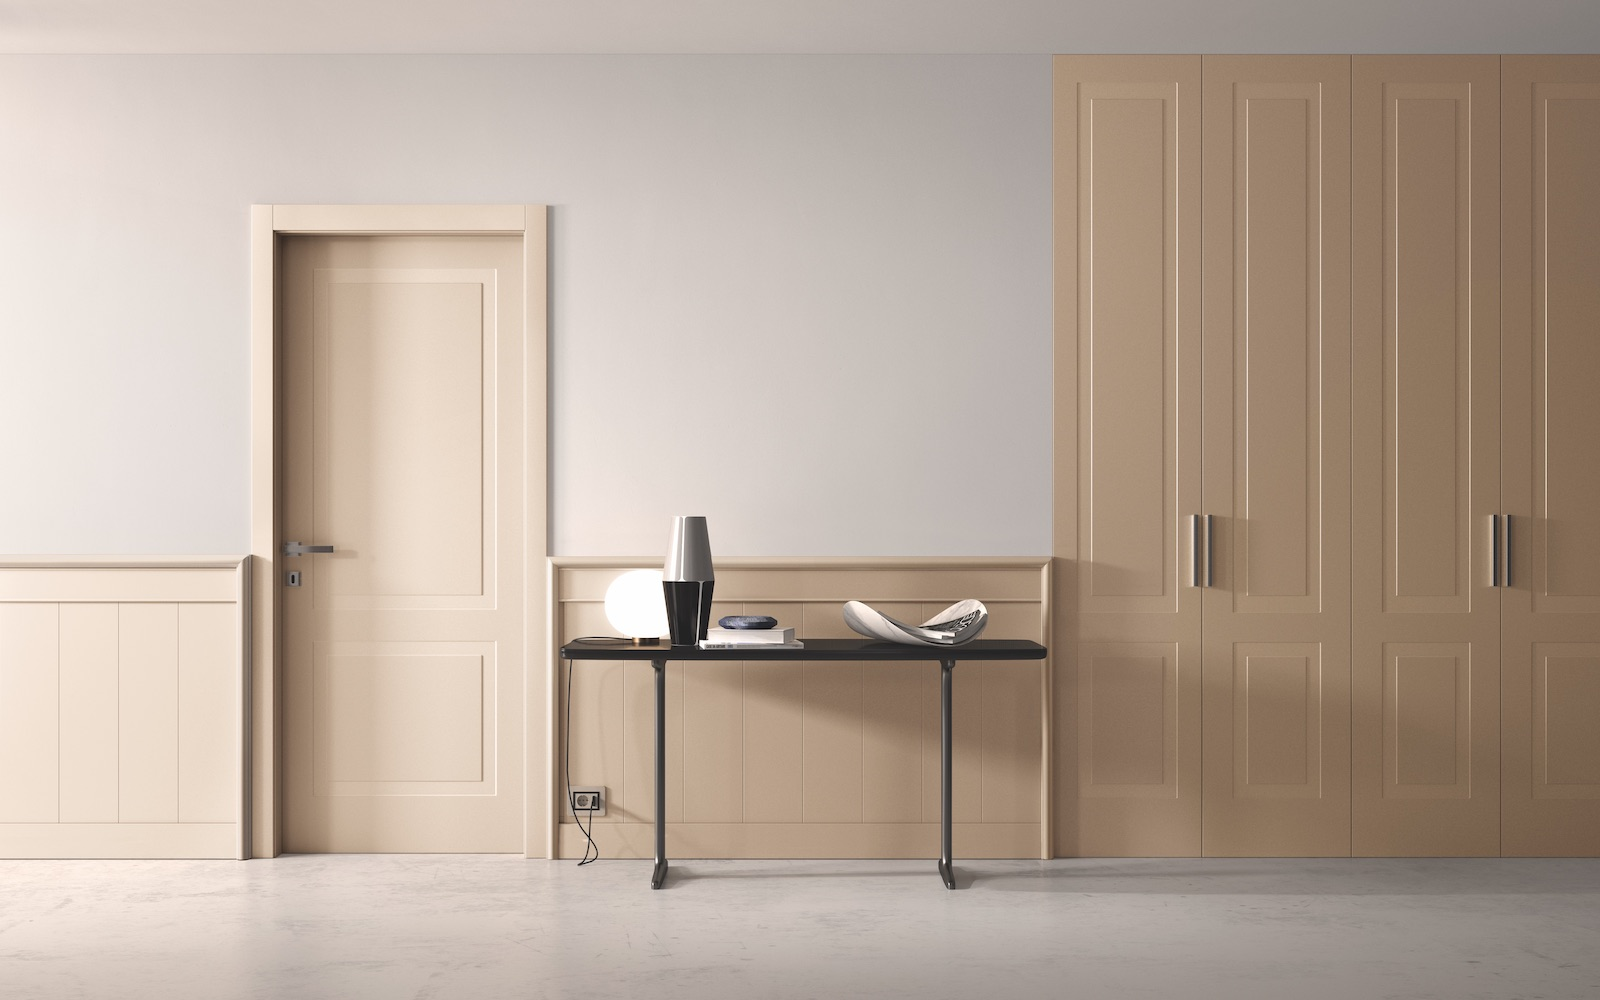 Porta laccata RAL pantografata - Garofoli